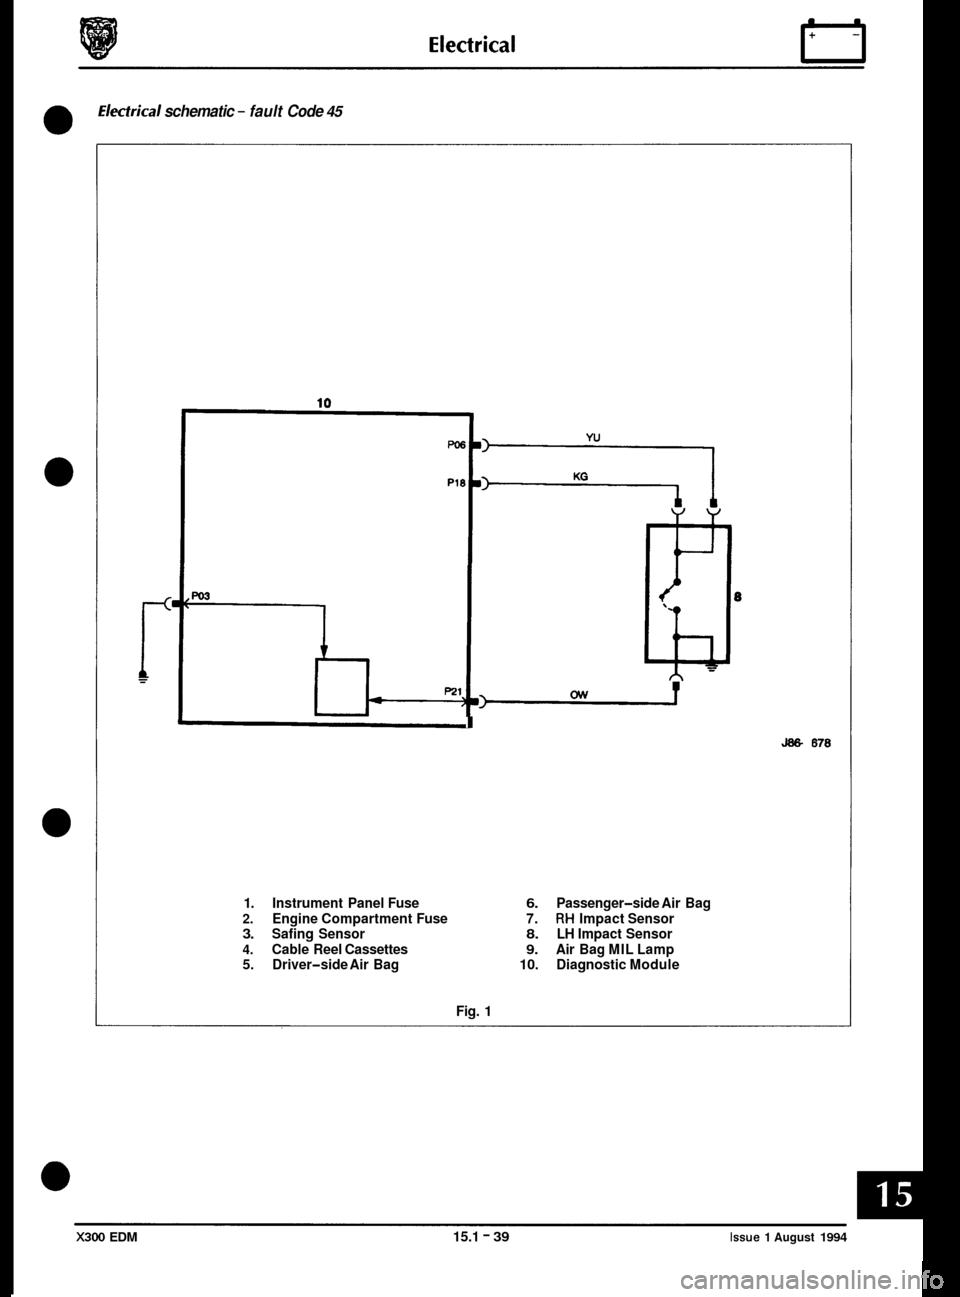 1994 Jaguar Xj6 Wiring Diagram   Wiring Liry on